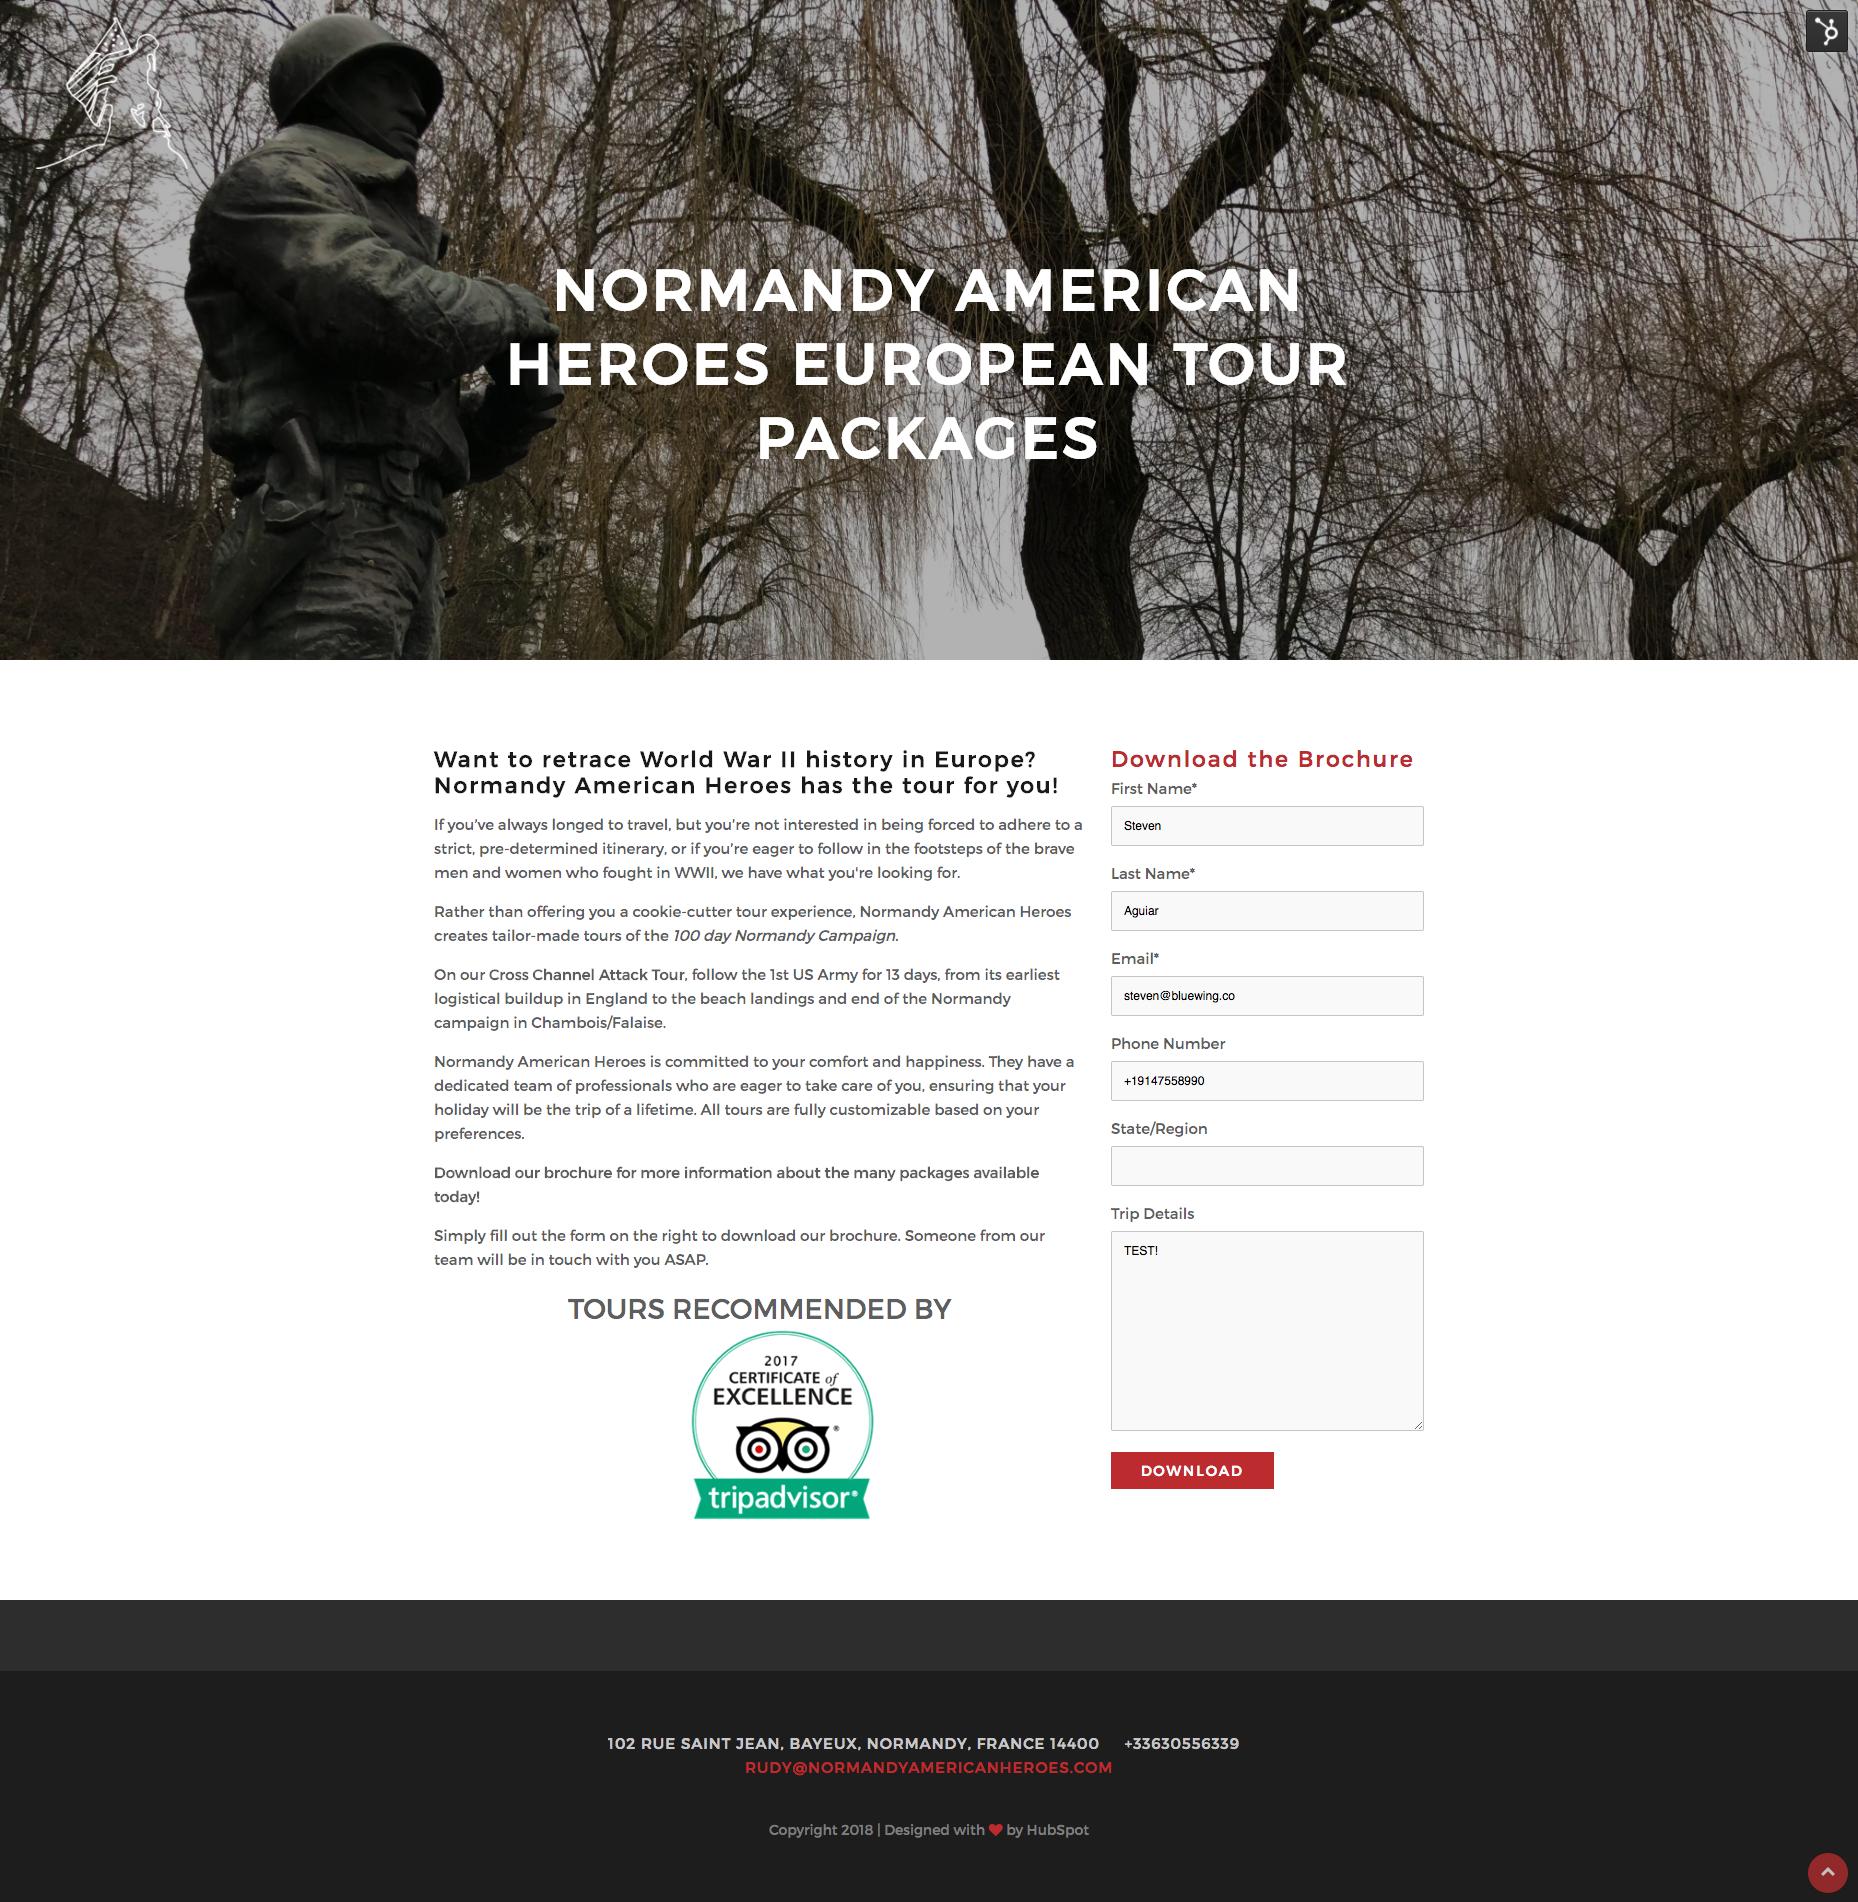 screencapture-normandyamericanheroes-normandy-american-heroes-european-tour-packages-2018-03-12-16_29_34